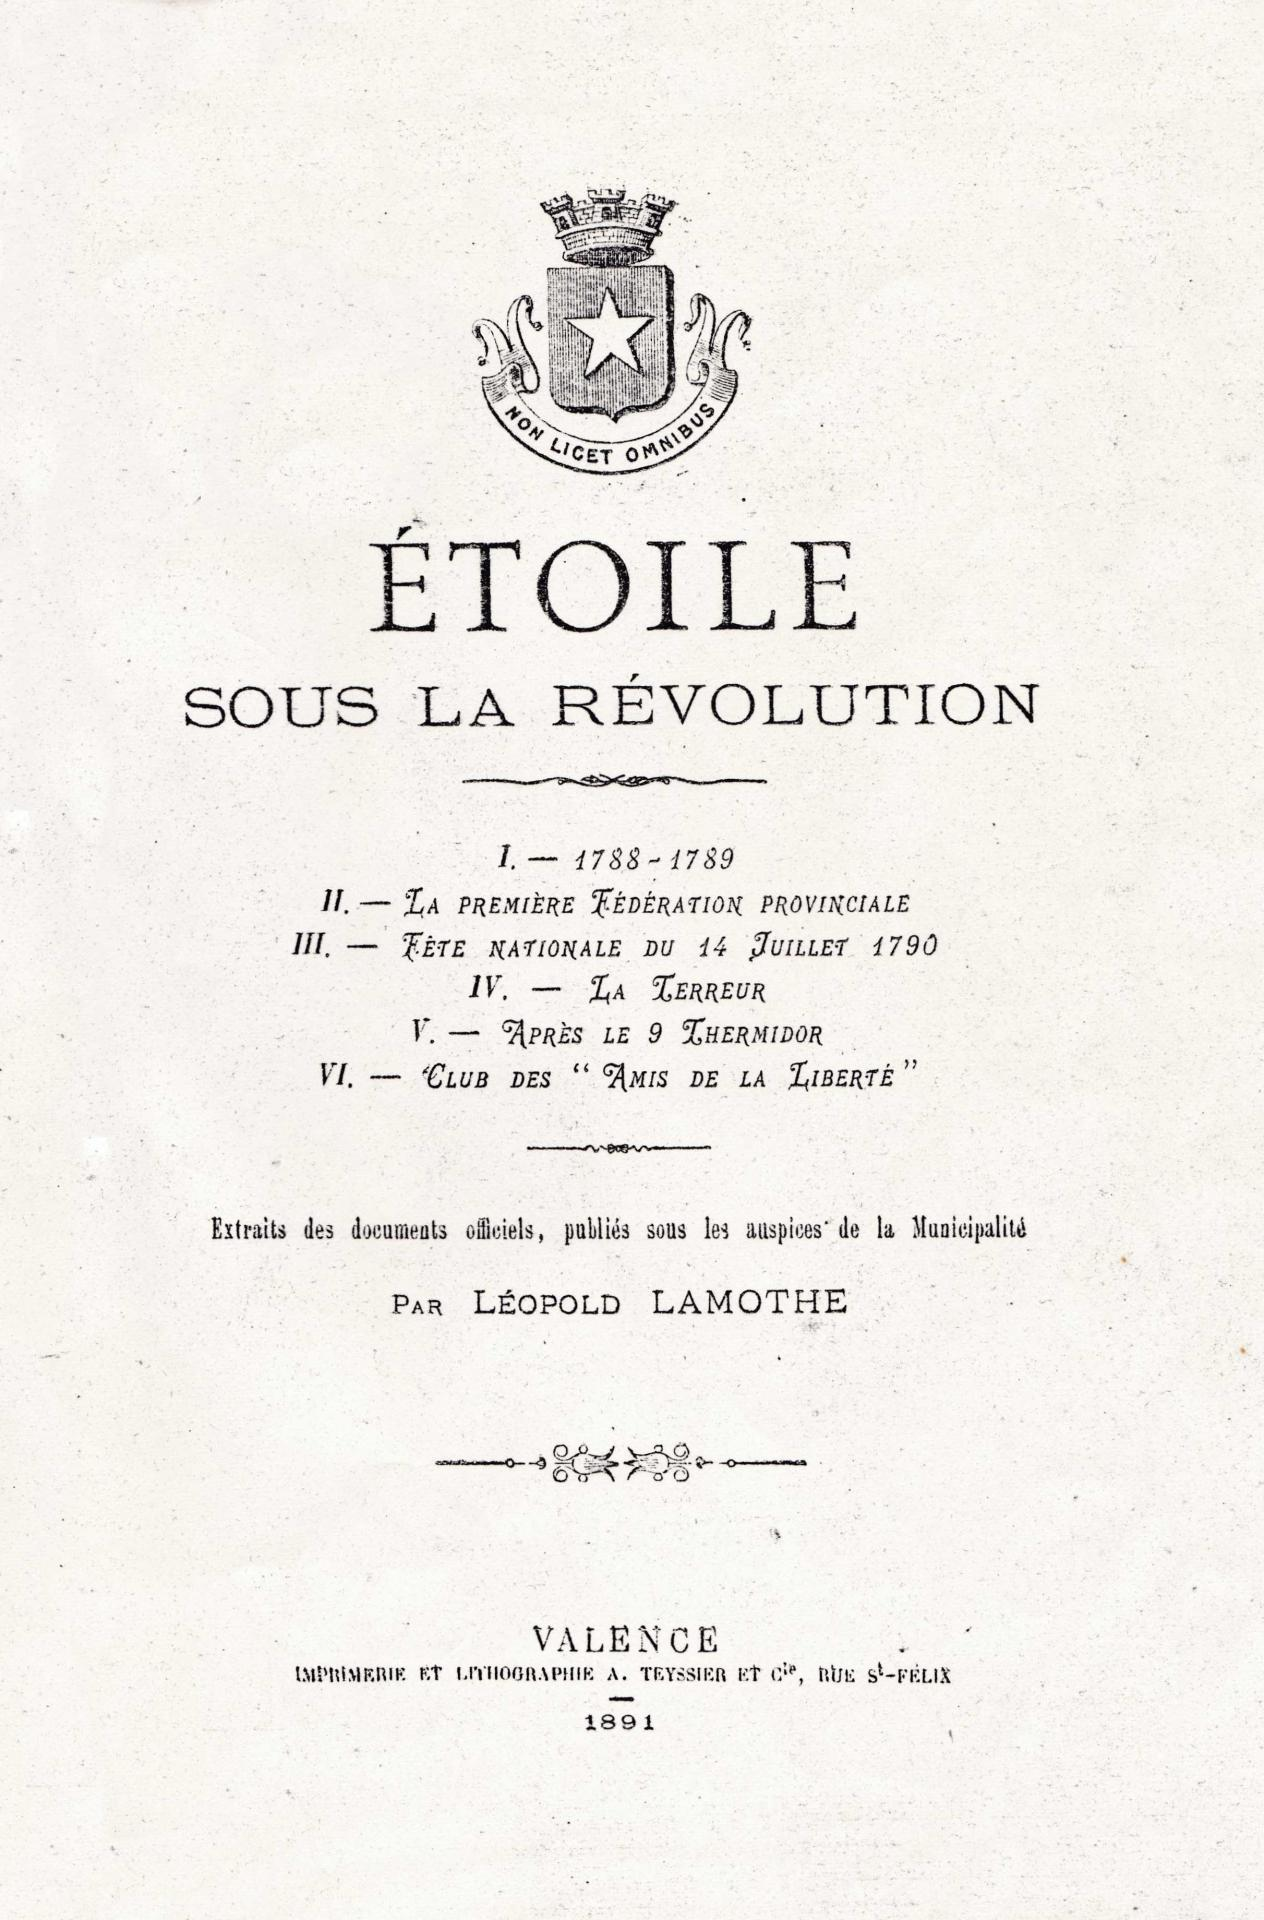 Etoile sous la Révolution, Léopold LAMOTH